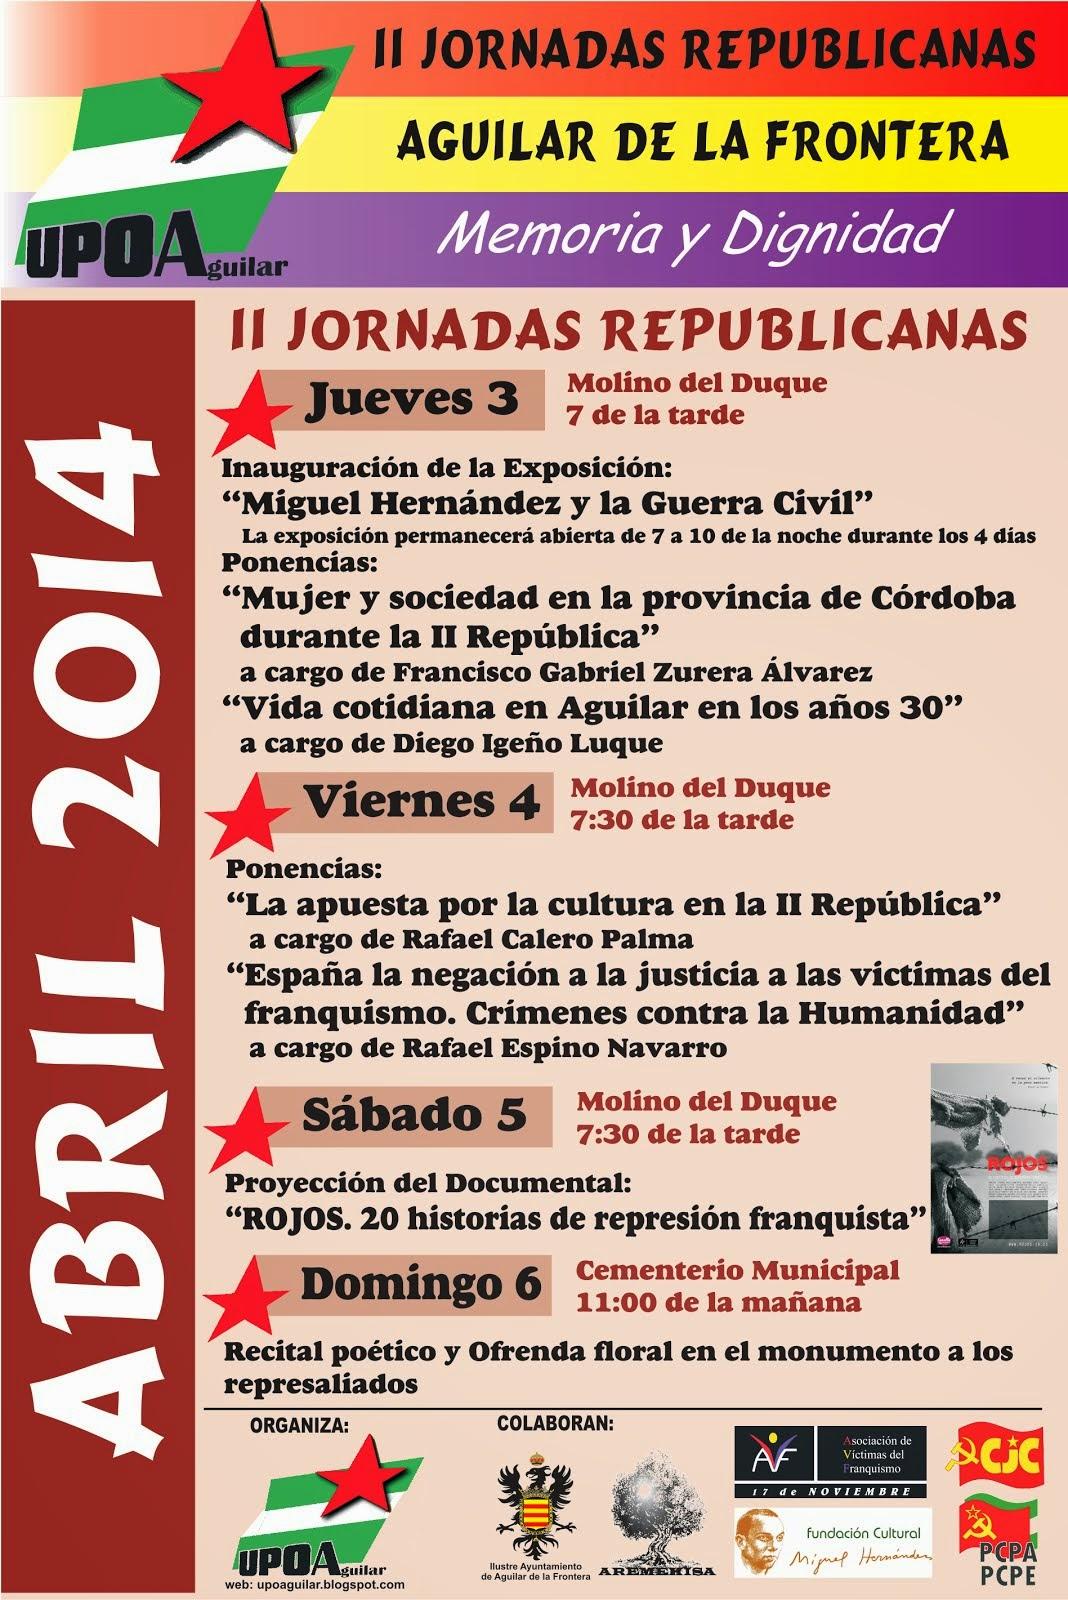 II Jornadas Republicanas Aguilar